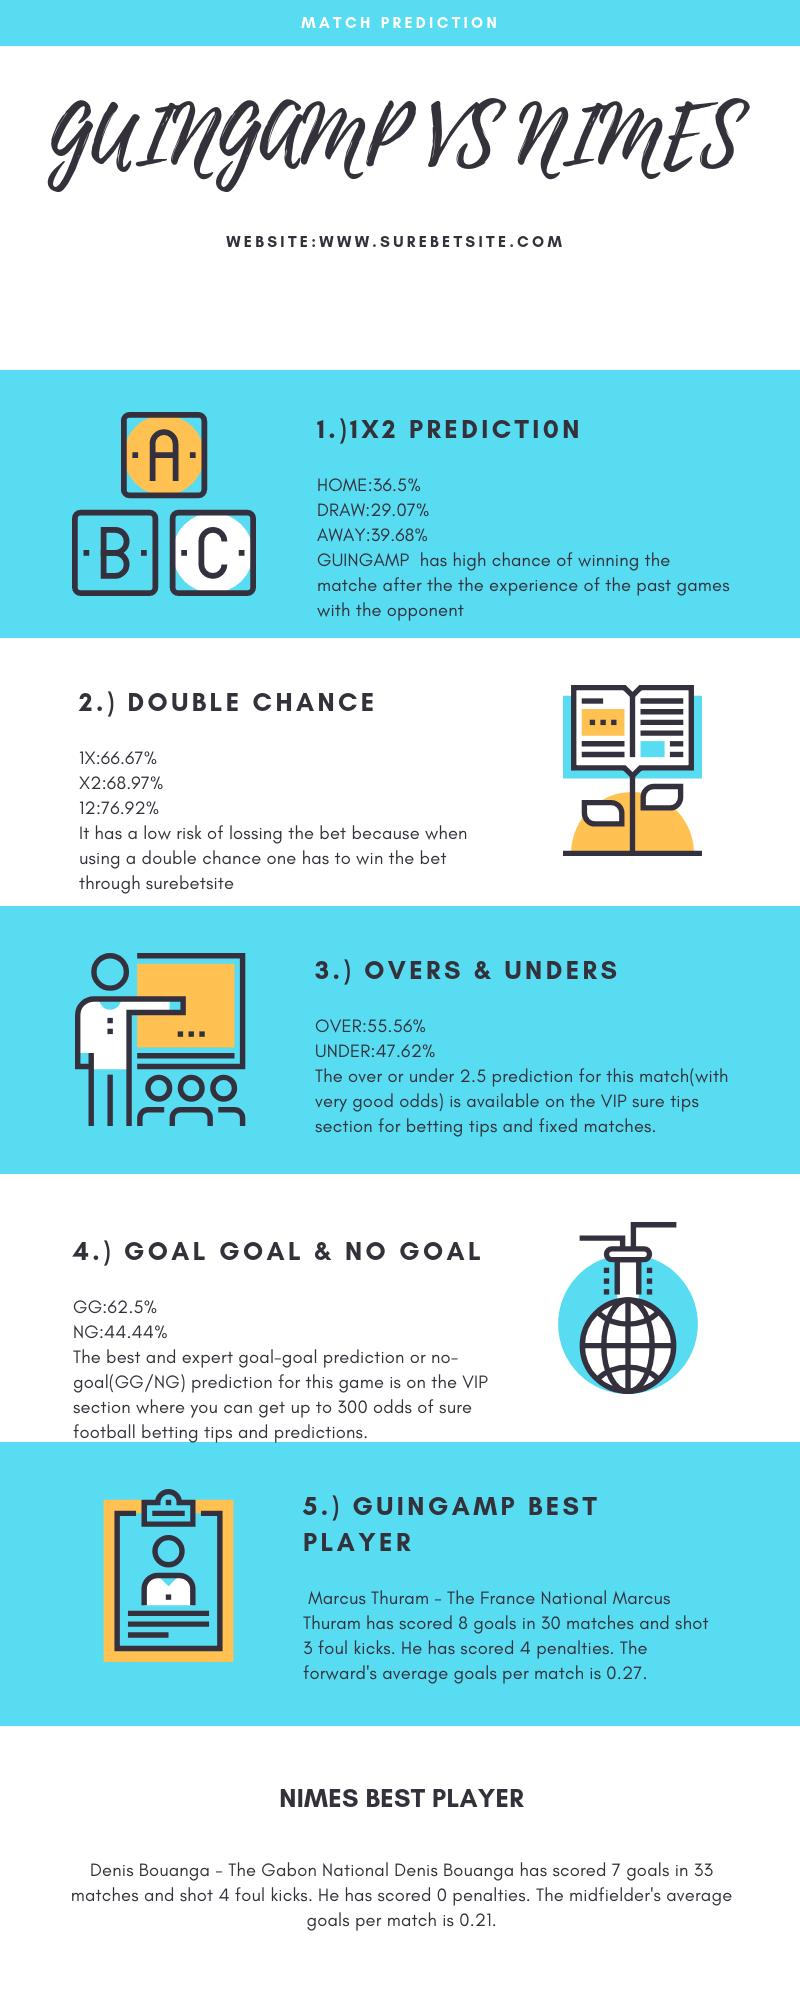 Guingamp vs Nimes prediction infographic